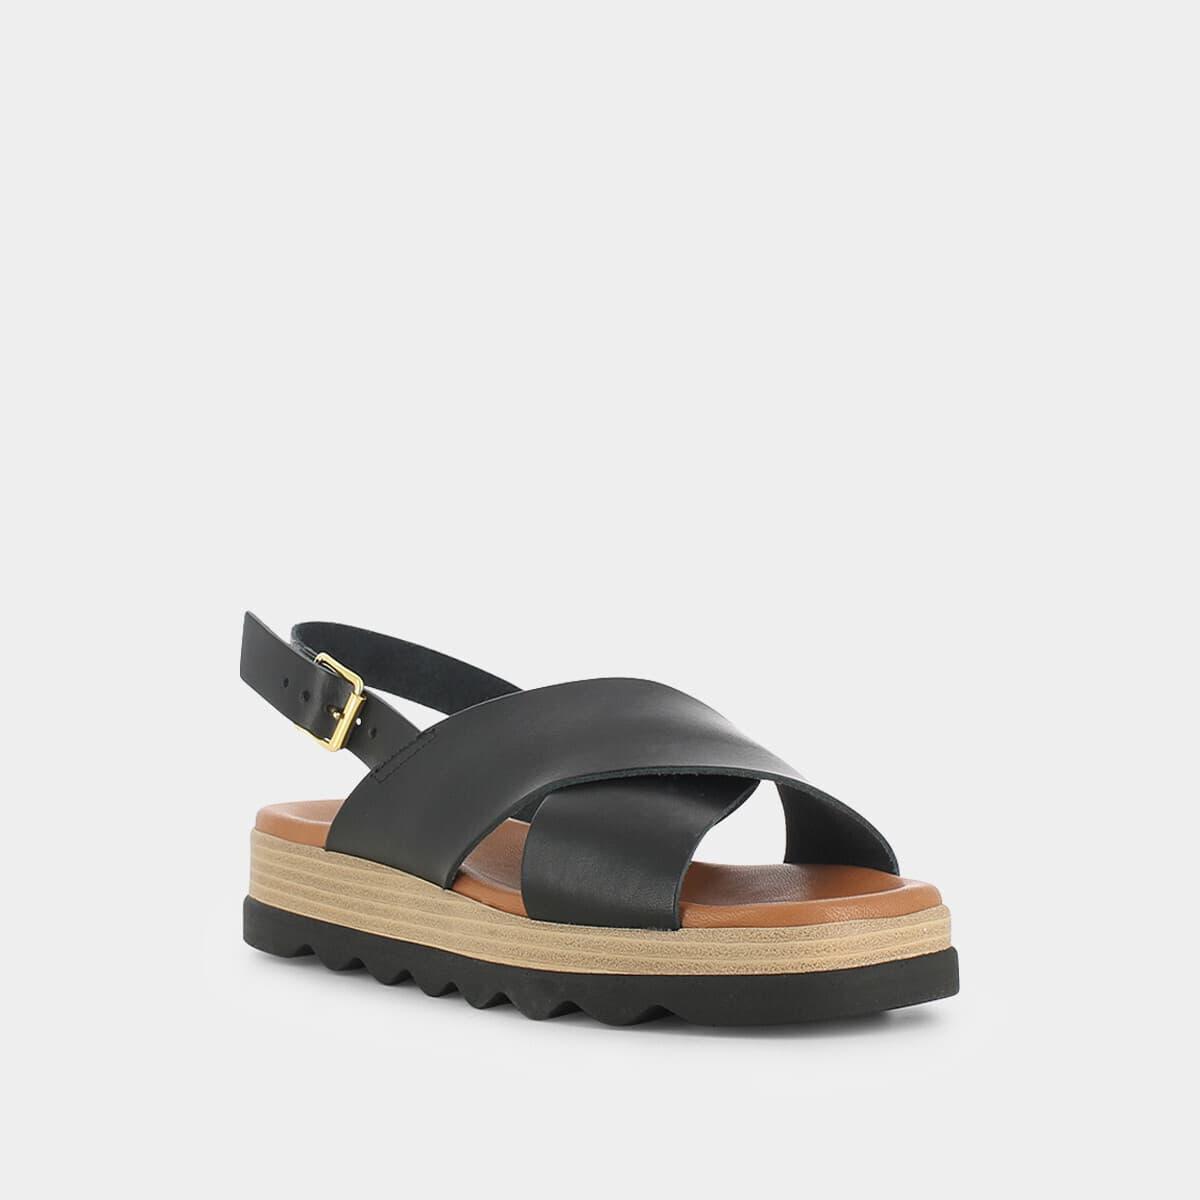 Collection Chaussures Femme Jonak Jonak Compensées Chaussures Collection Compensées Collection Femme BYwdAAUq